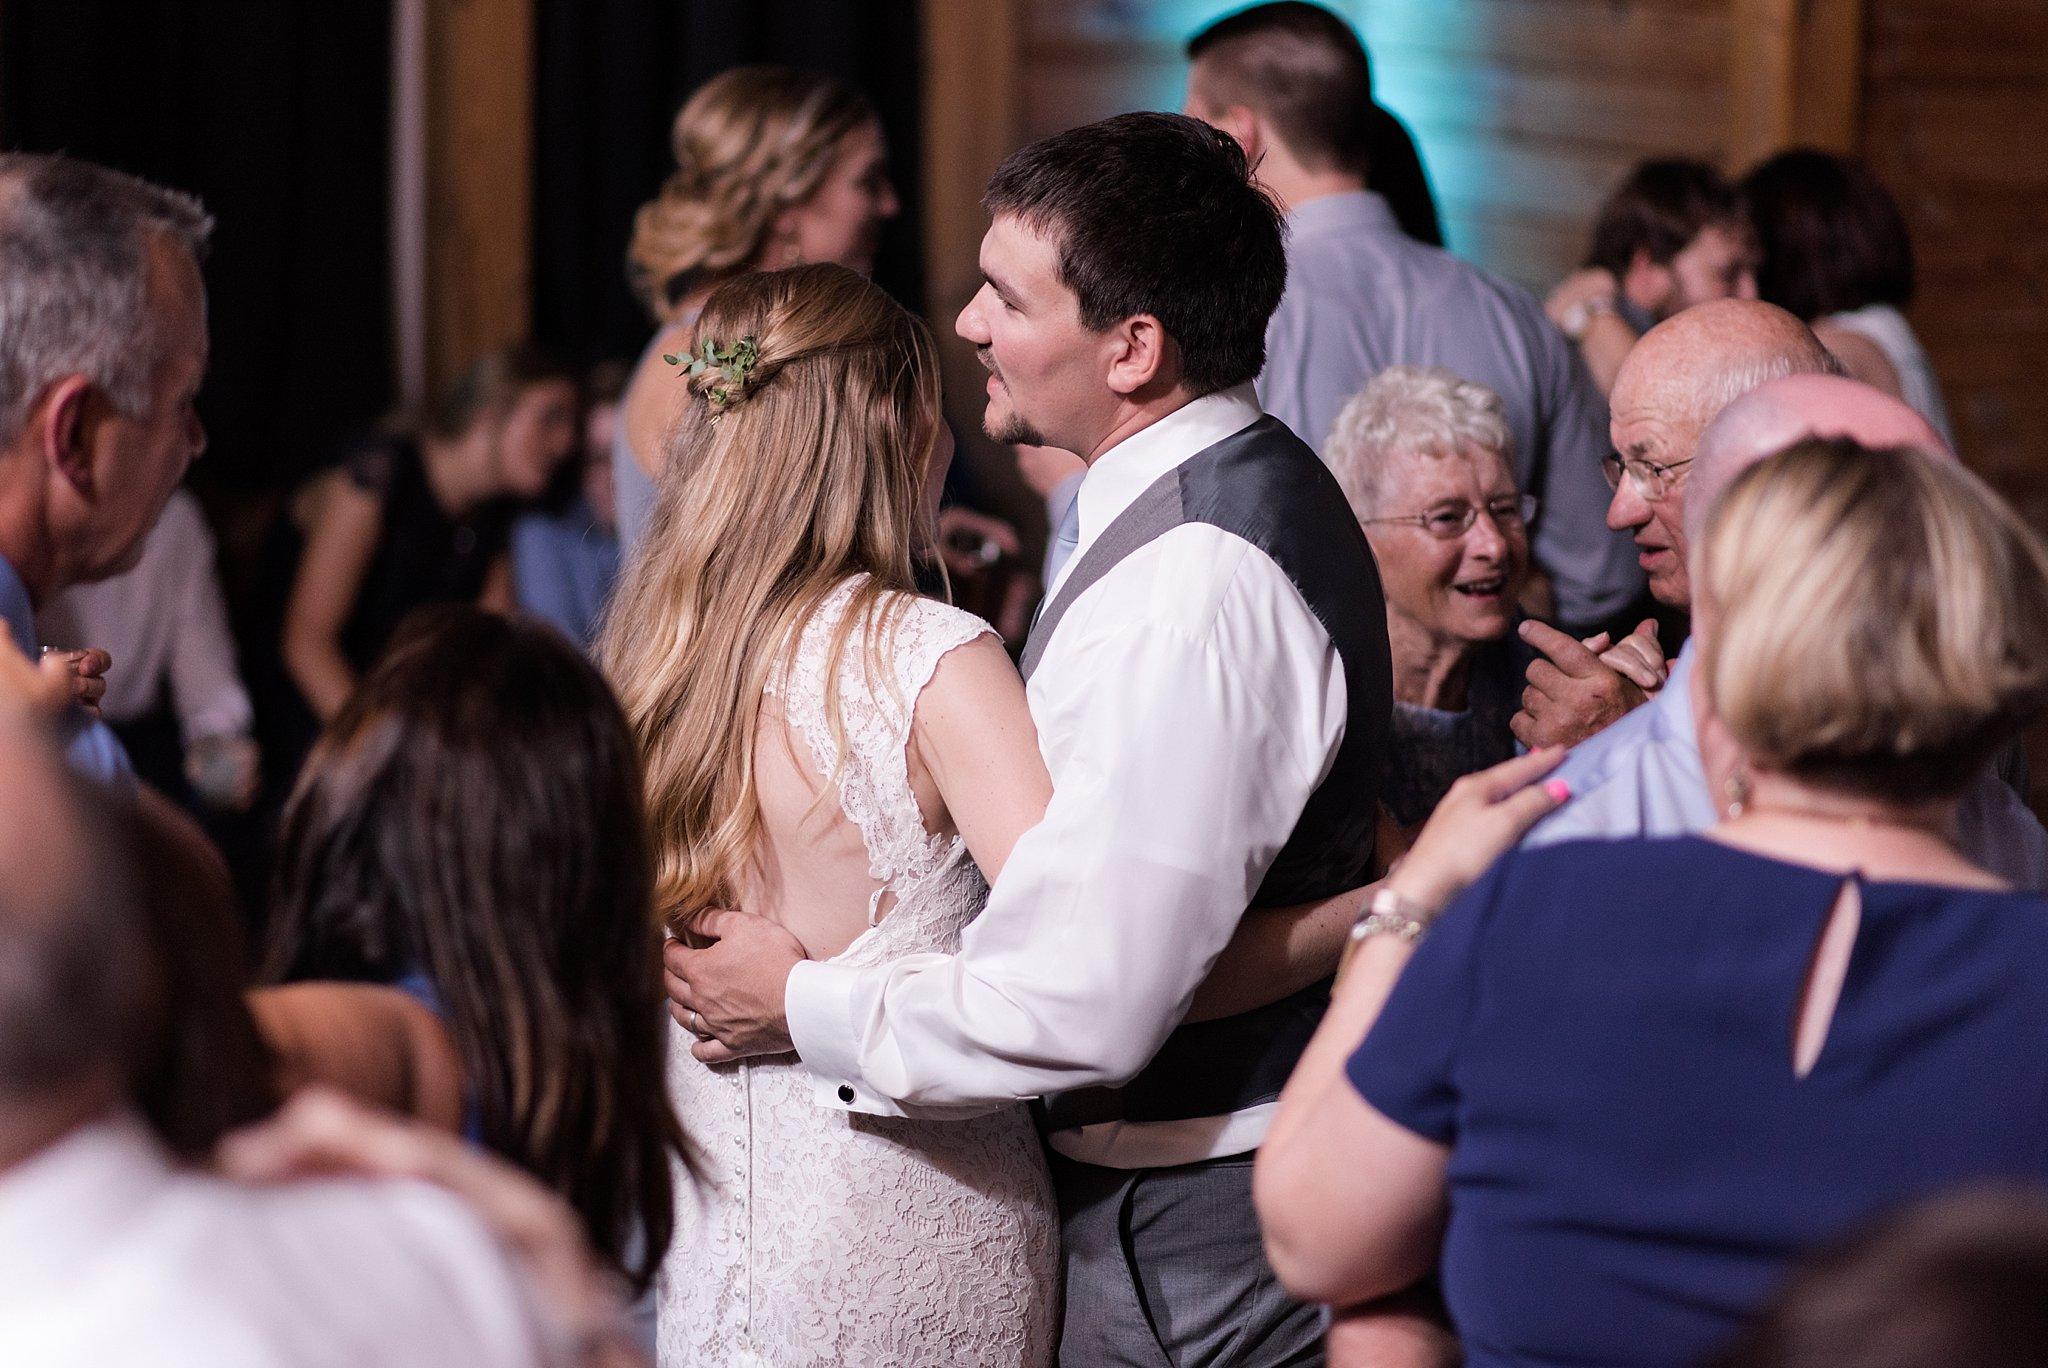 Cadillac-Michigan-wedding-caberfae-peaks-milwaukee-photographer_0109.jpg